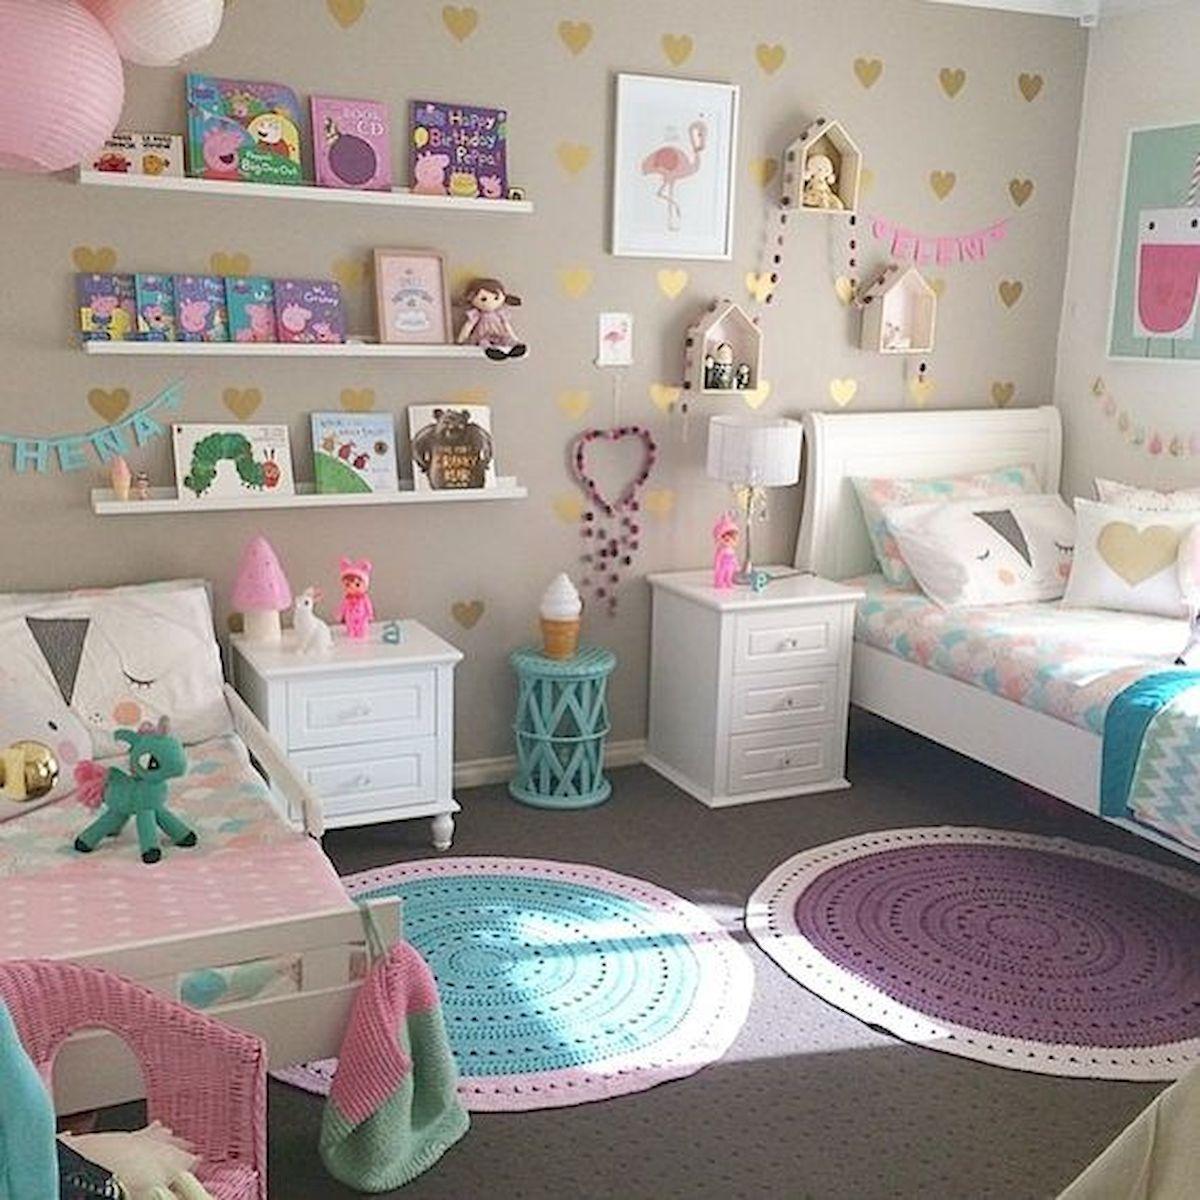 22 Best DIY Crafts for Bedroom Walls (16)